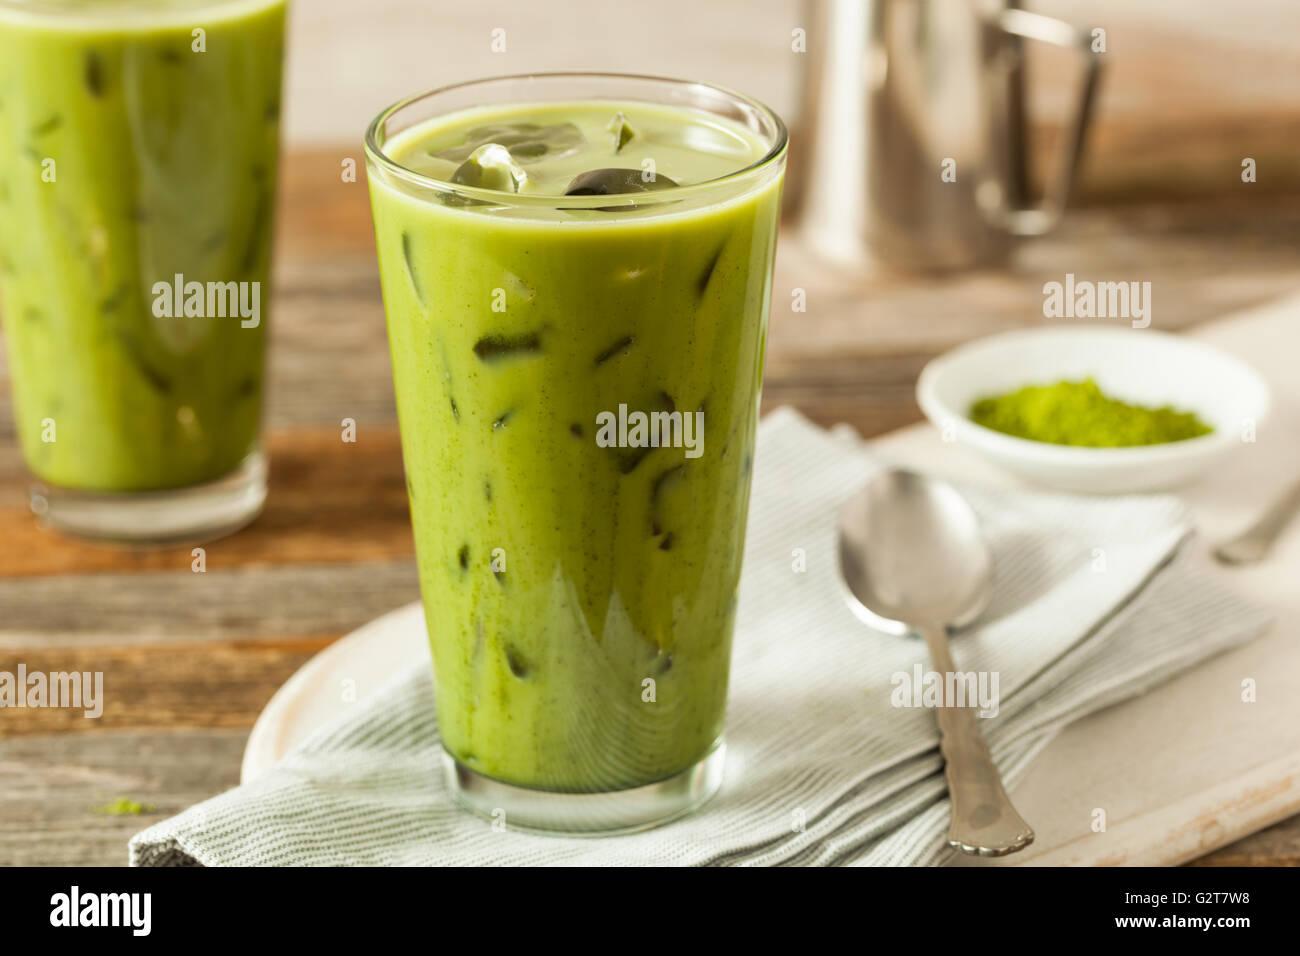 Homemade Iced Matcha Latte Tea with Milk - Stock Image